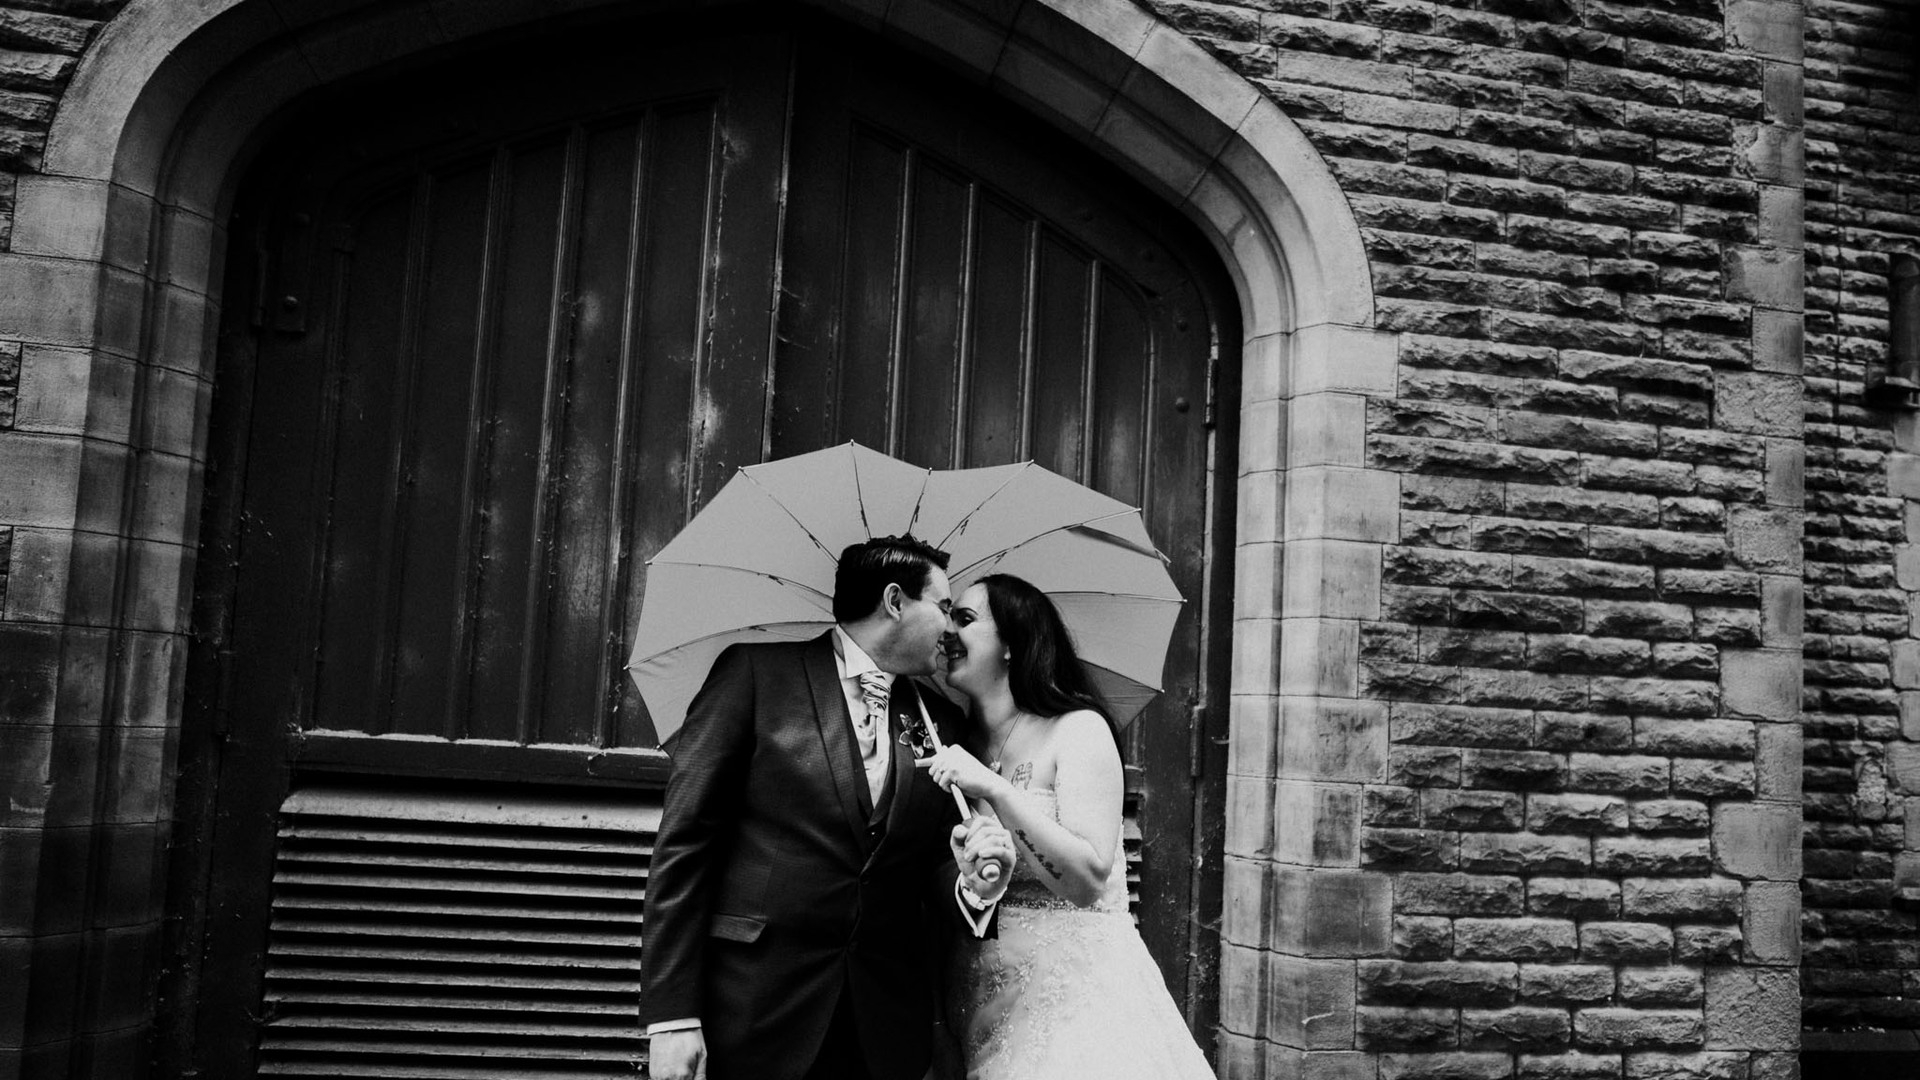 dramtic alternative winter wedding image of bride and groom kissing under heart umbrella in manchester